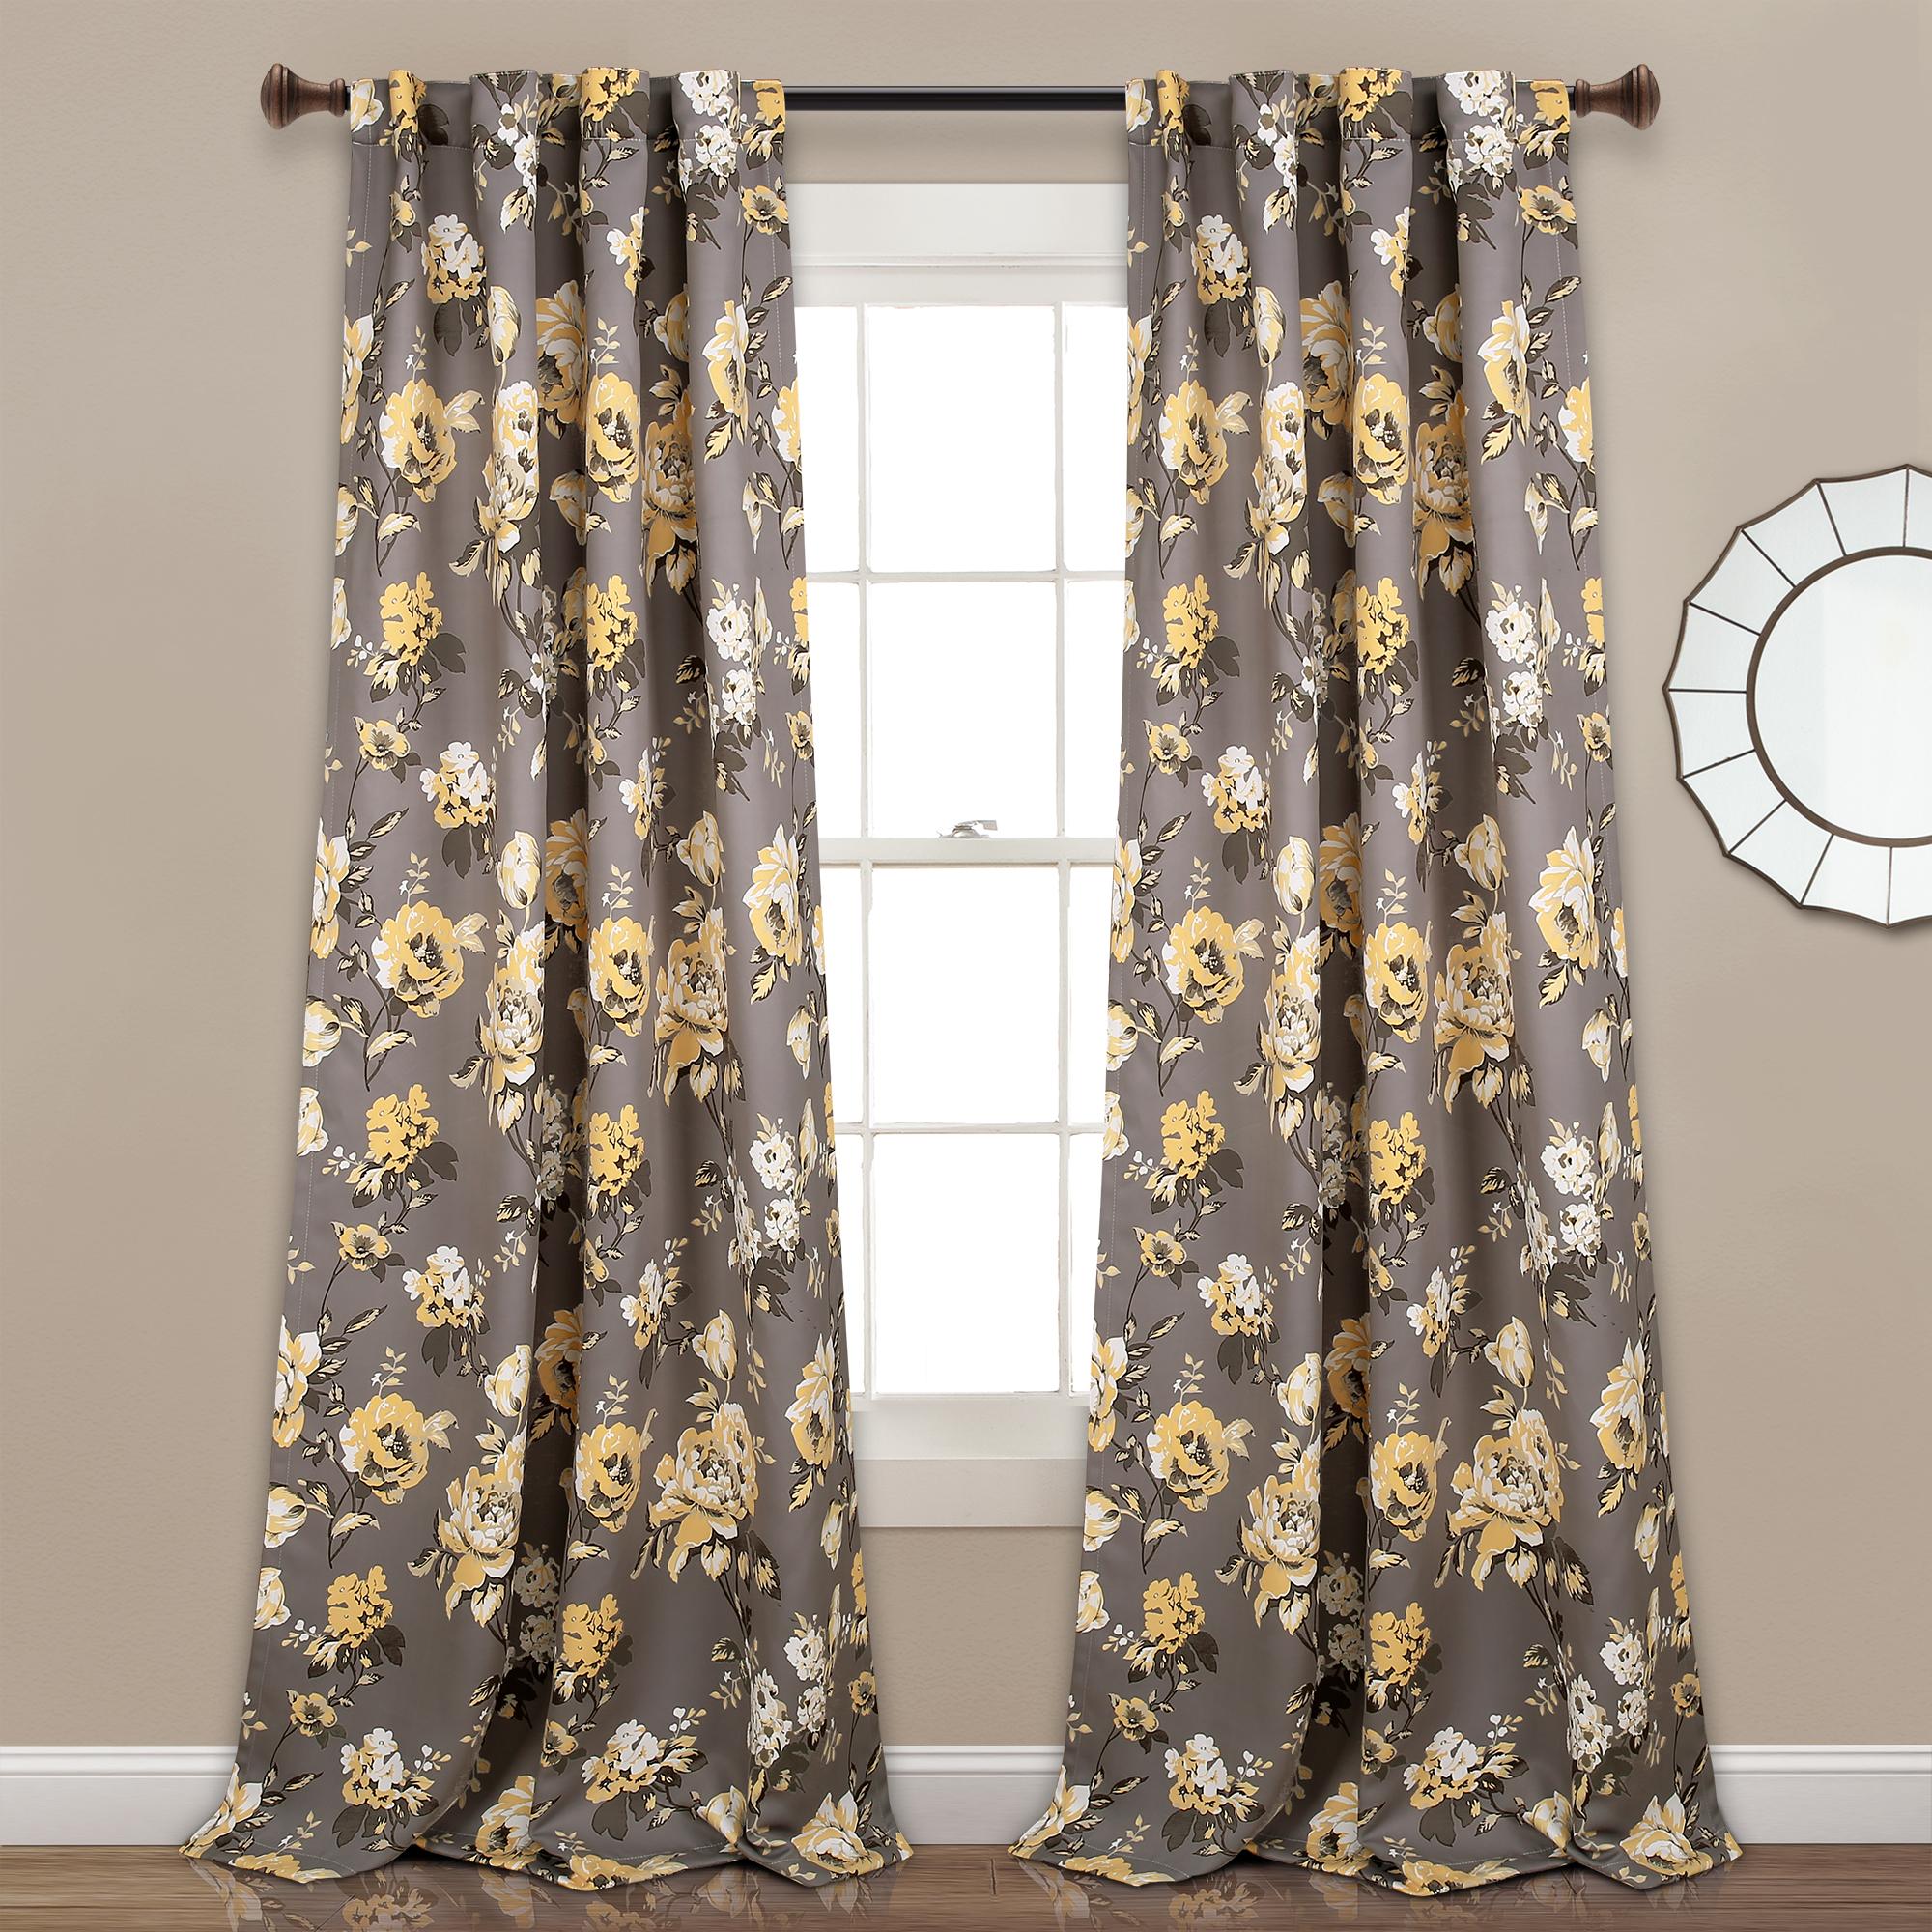 Tania Floral Room Darkening Window Curtain Panels